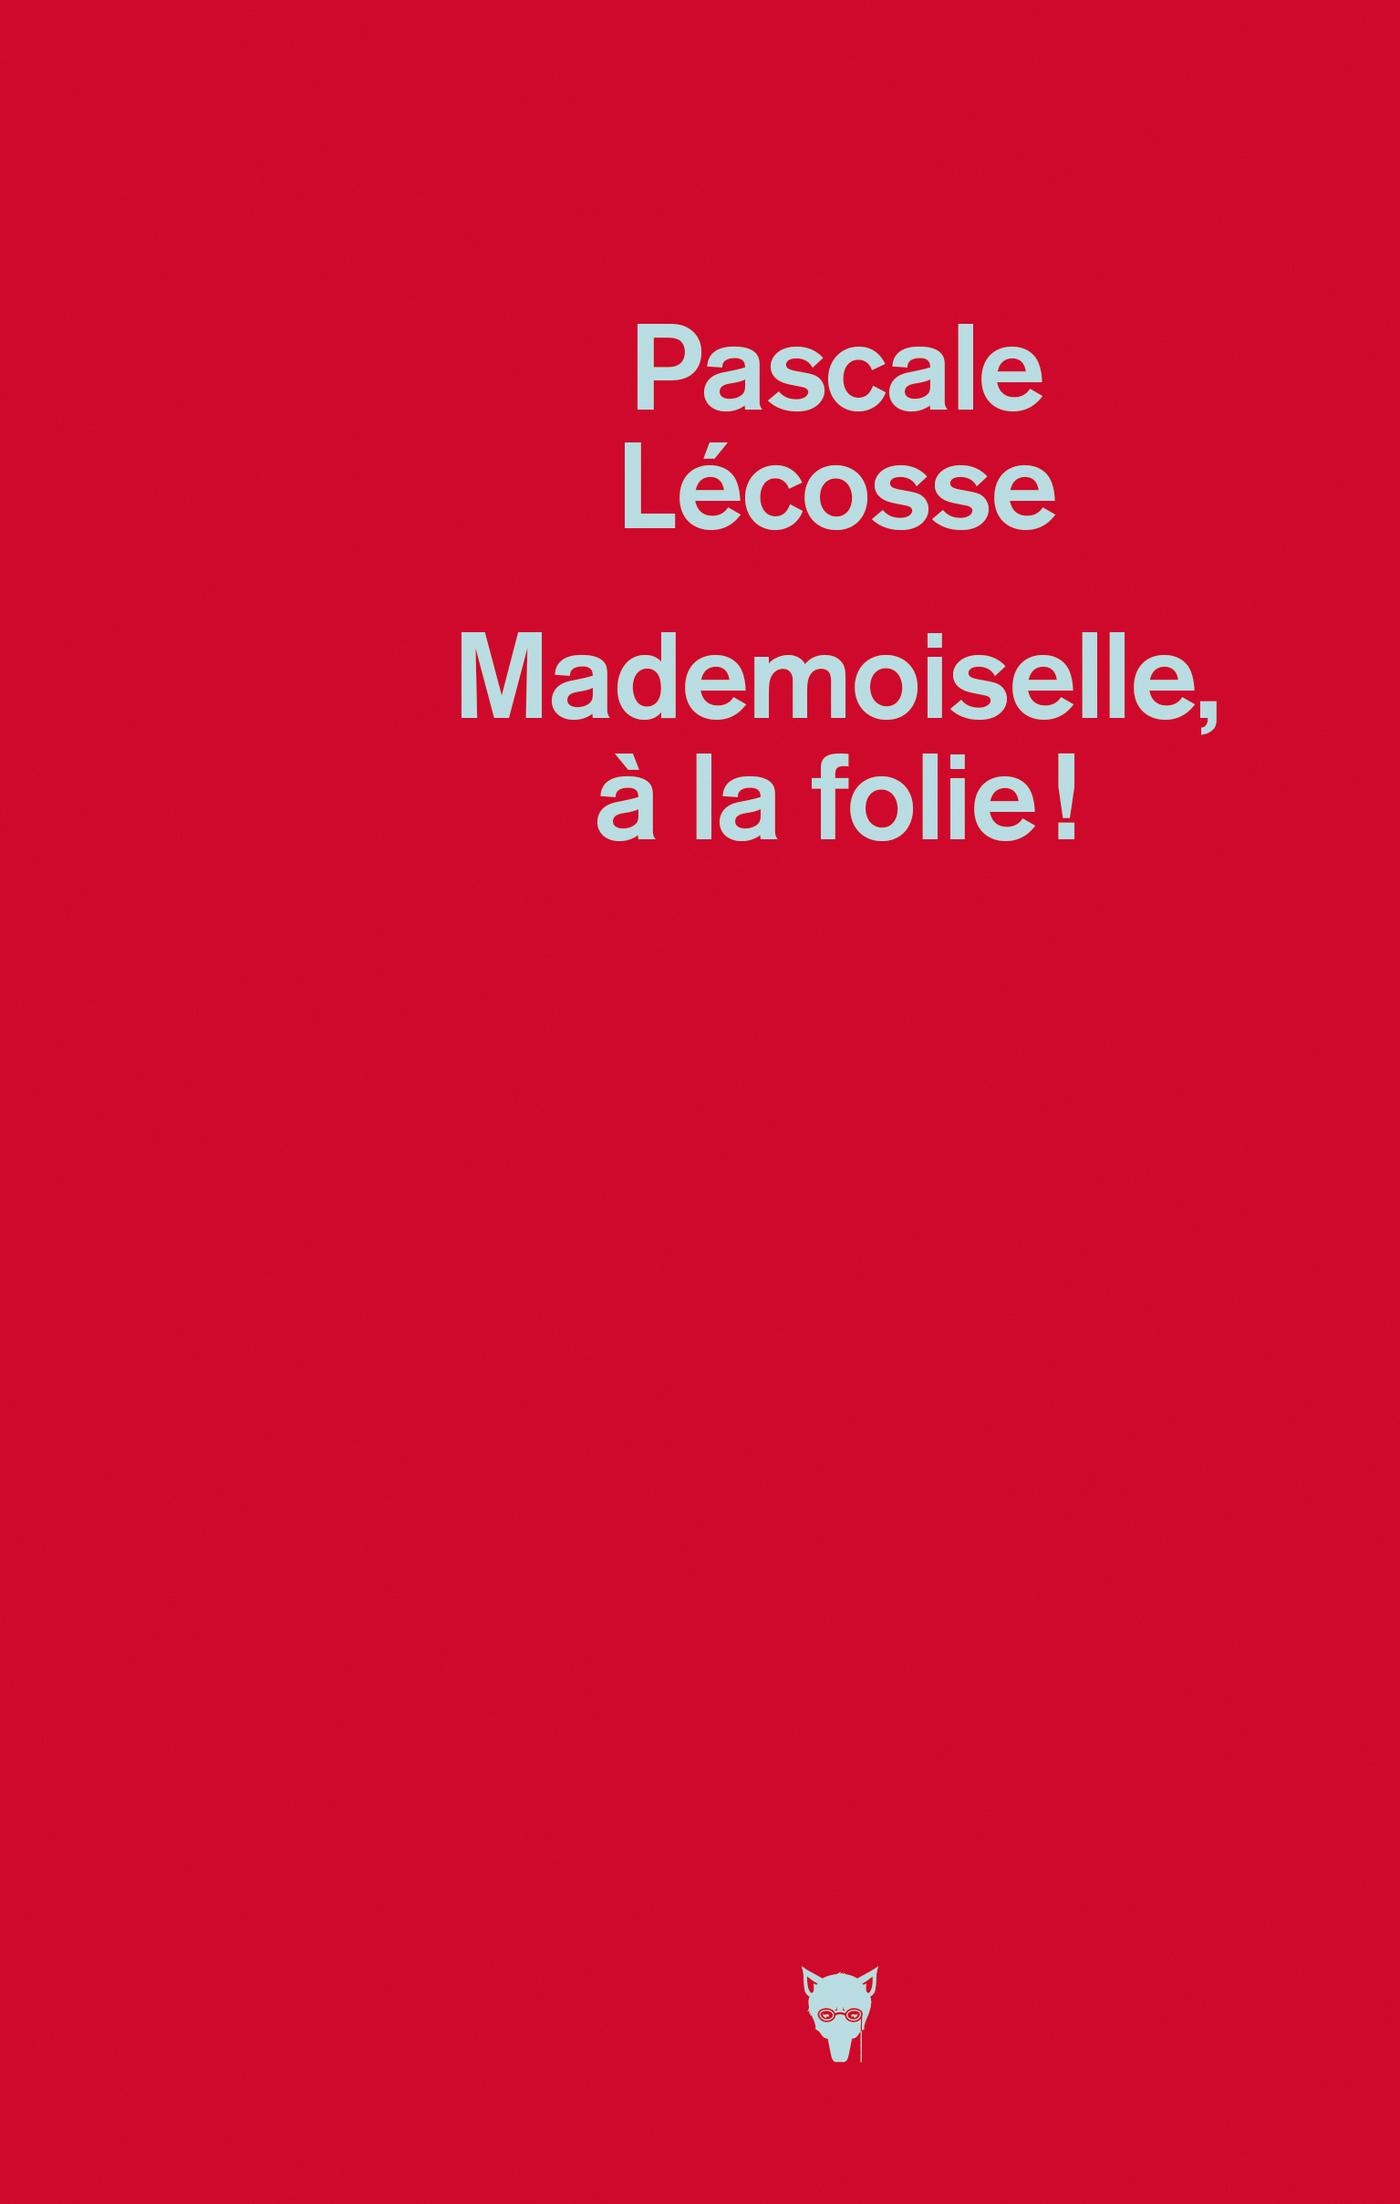 Mademoiselle, à la folie !